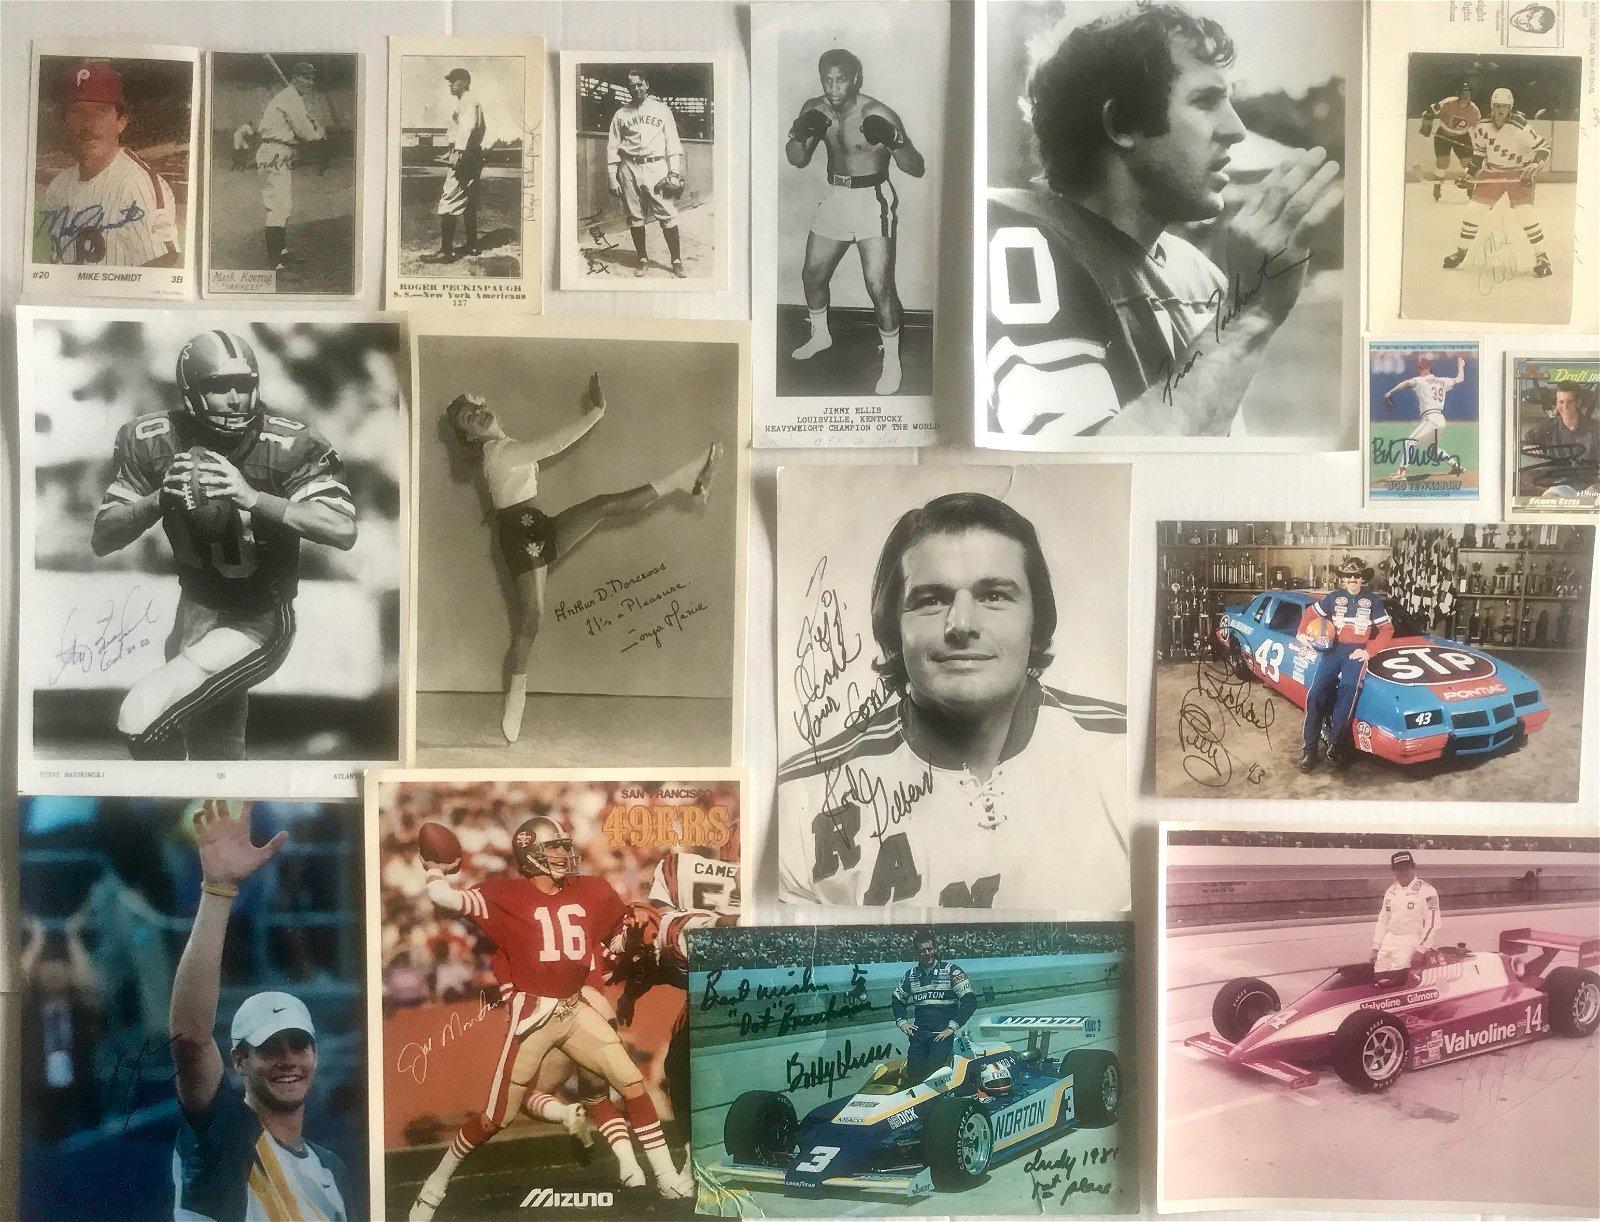 Autographed Photograph & Inscribed Sport Memorabilia